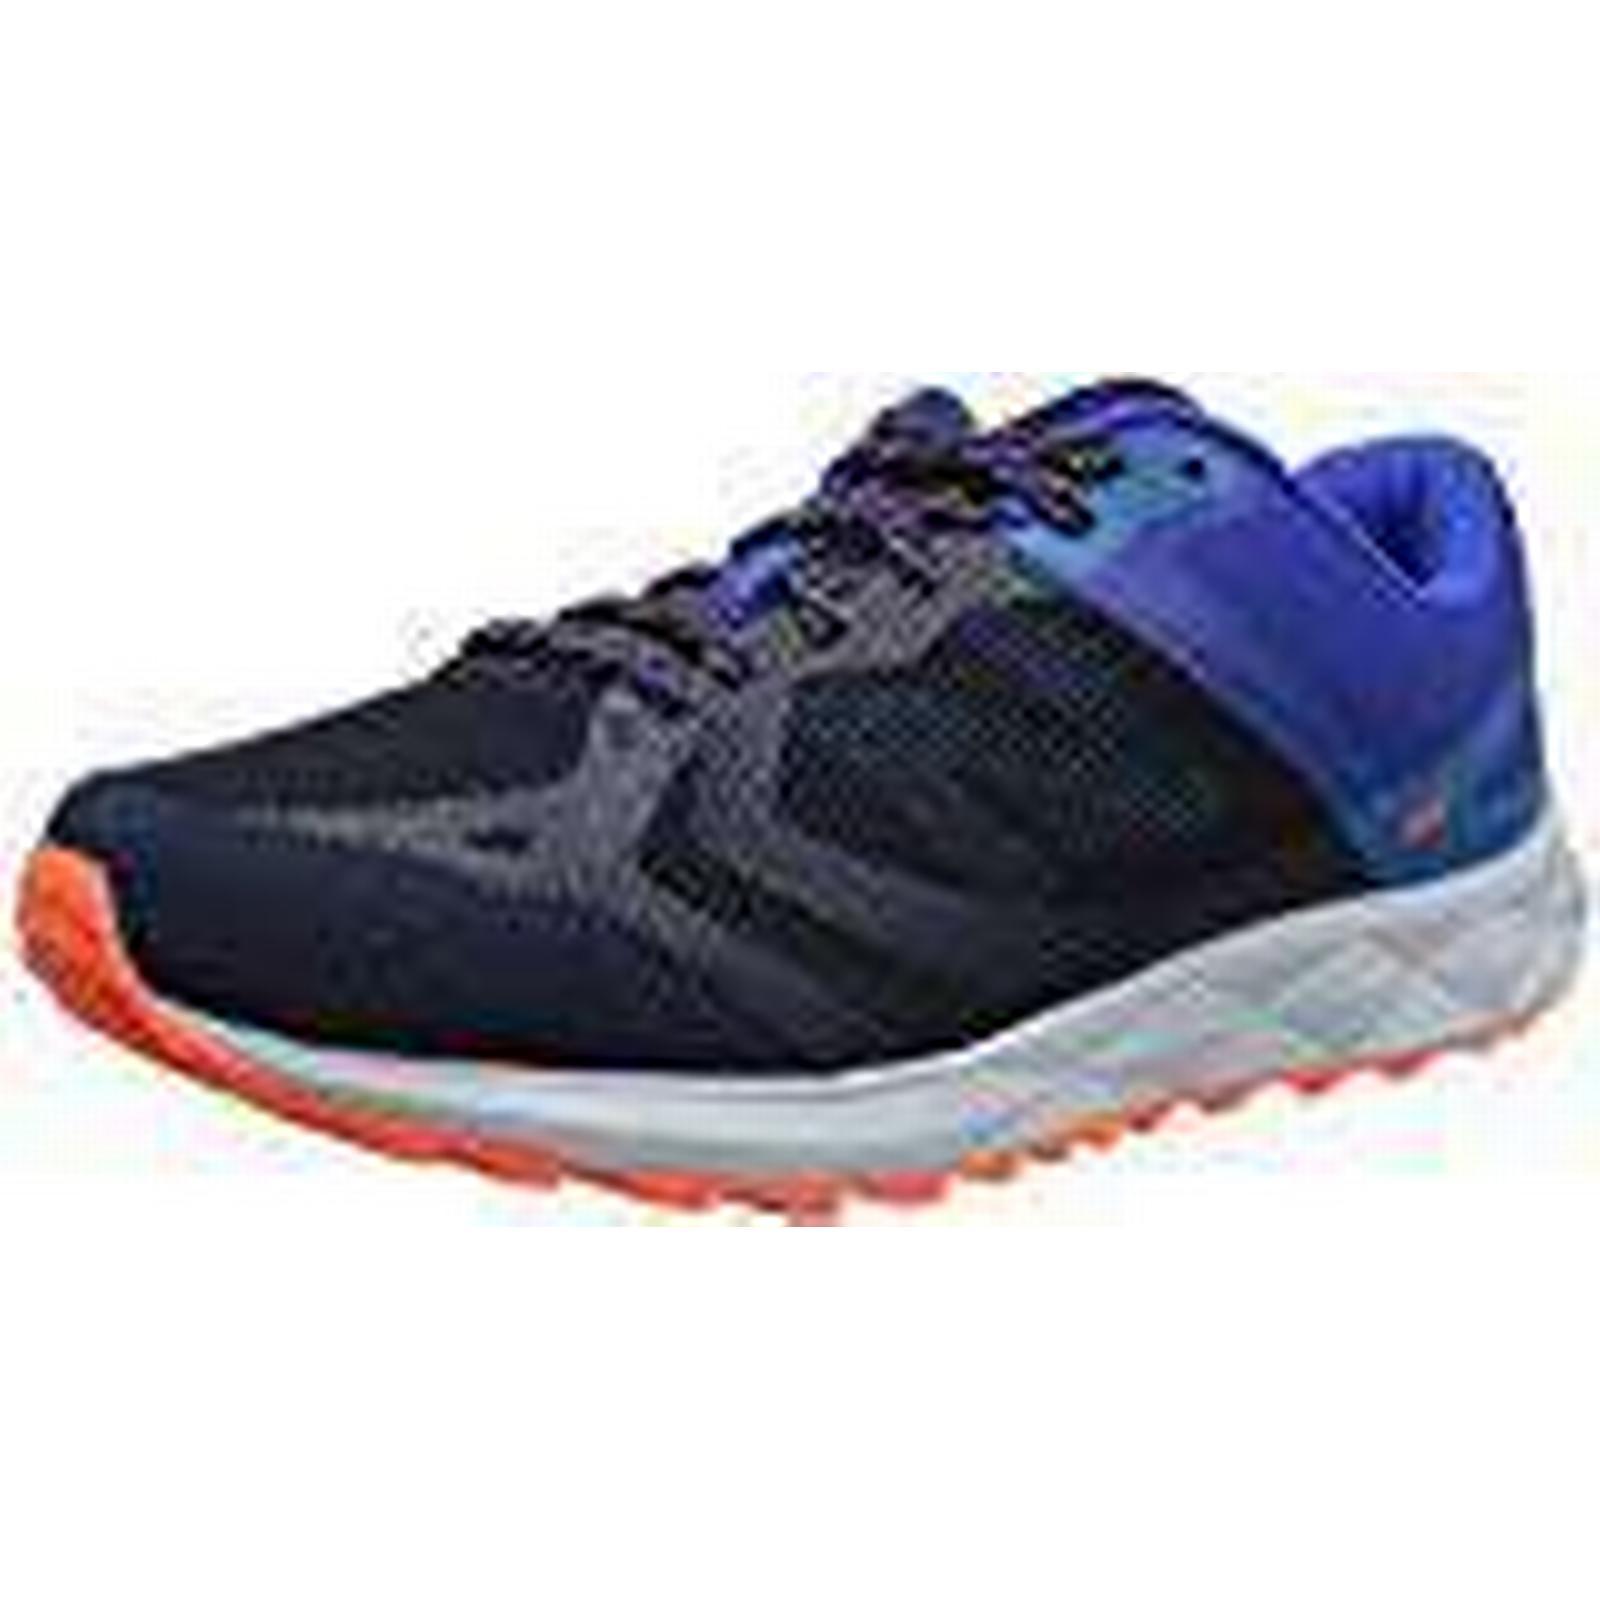 New Balance Men's Mt590V3 8 Running Shoes, Blue (Navy), 8 Mt590V3 UK 42 EU 8323d9